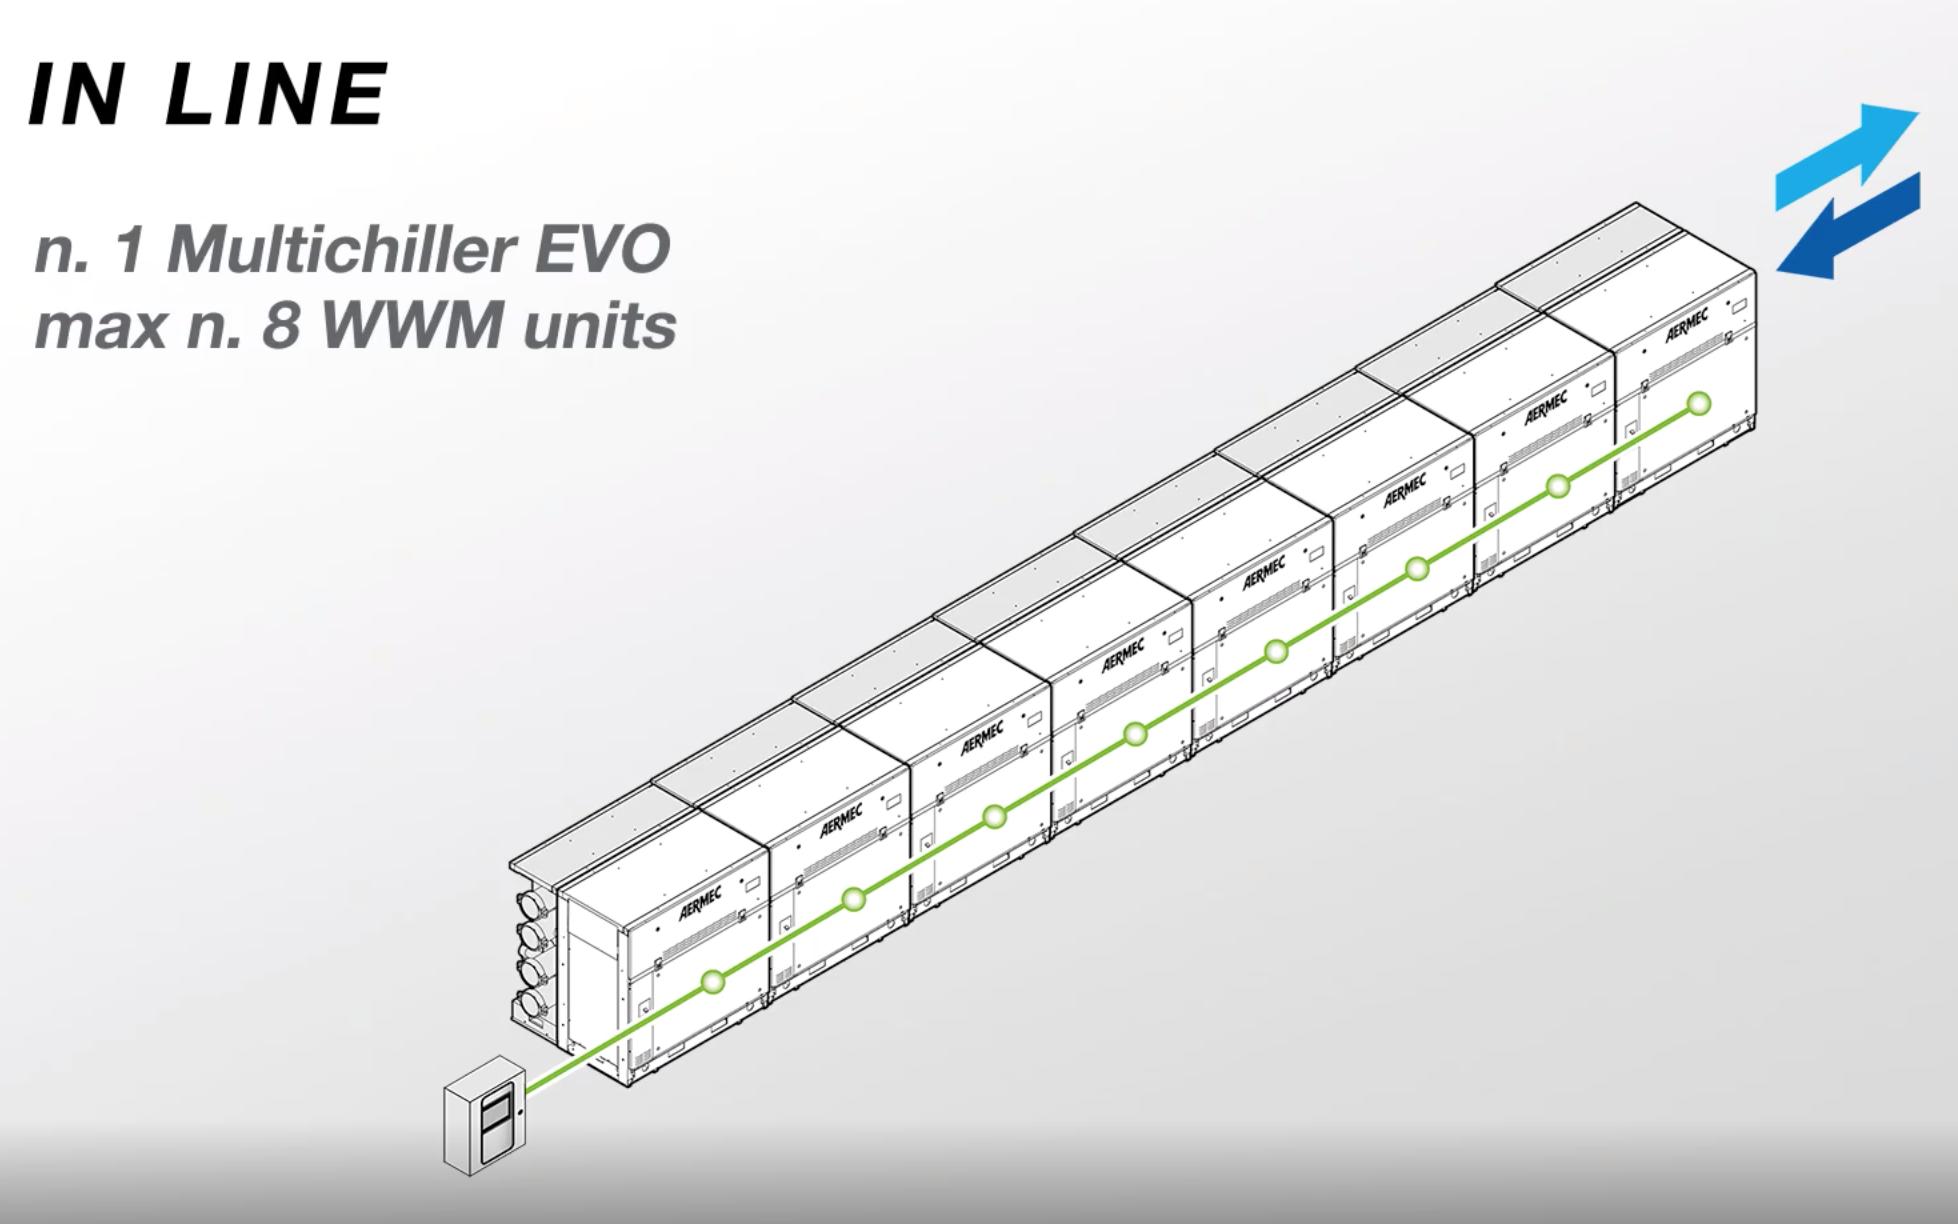 Aermec WWM Modular Chiller - Configuration In Line